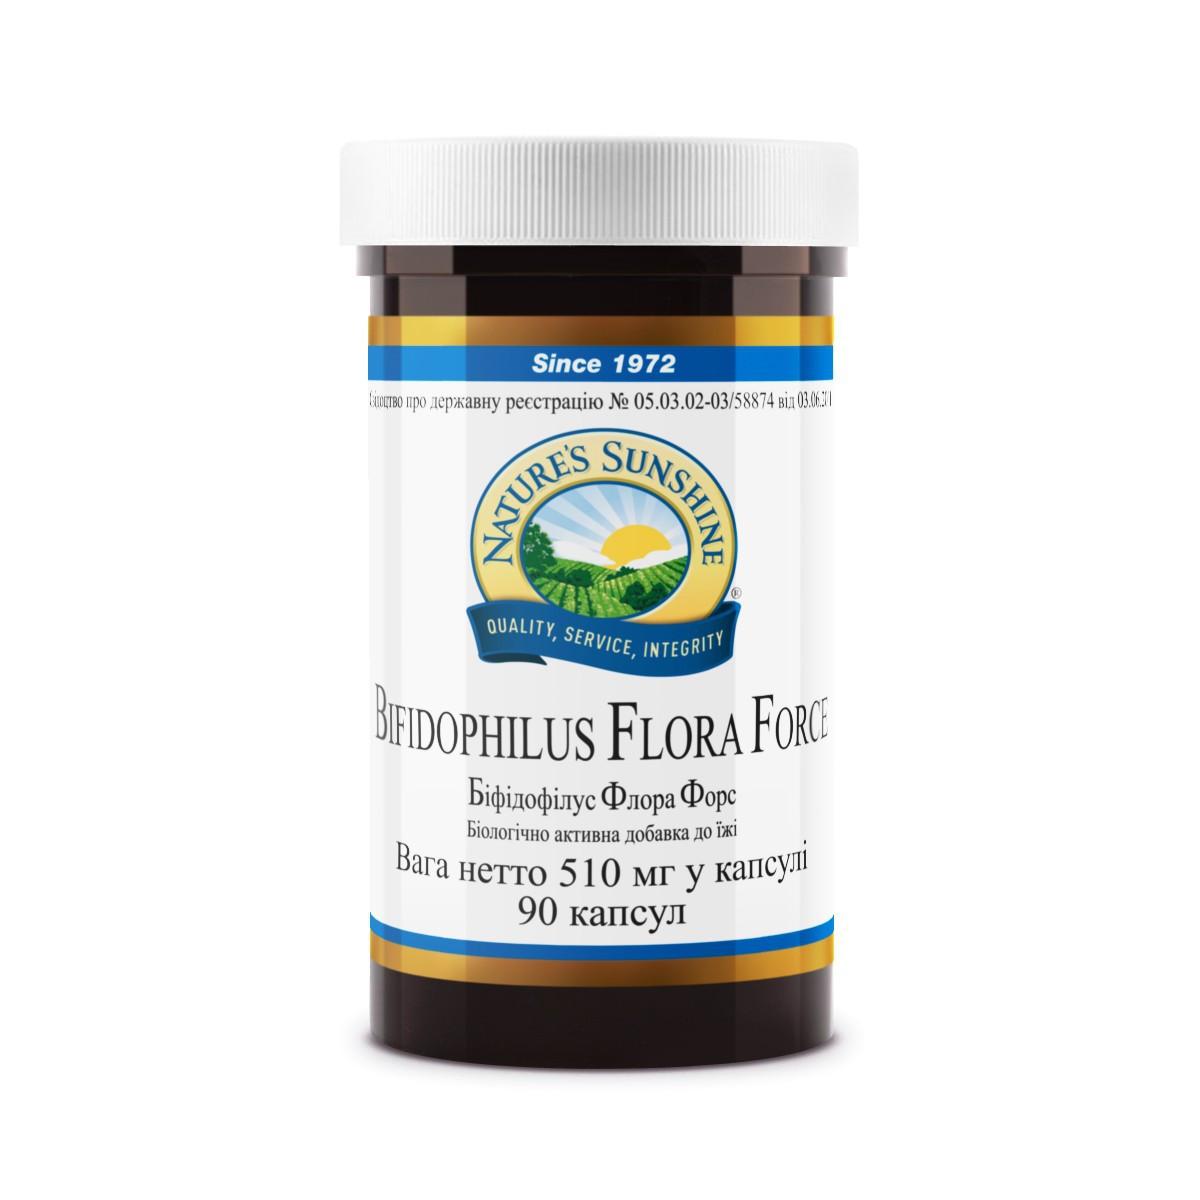 Лакто-і біфідобактерії Бифидофилус Флора Форс NSP (Bifidophilus Flora Force) 90 кап. Original США